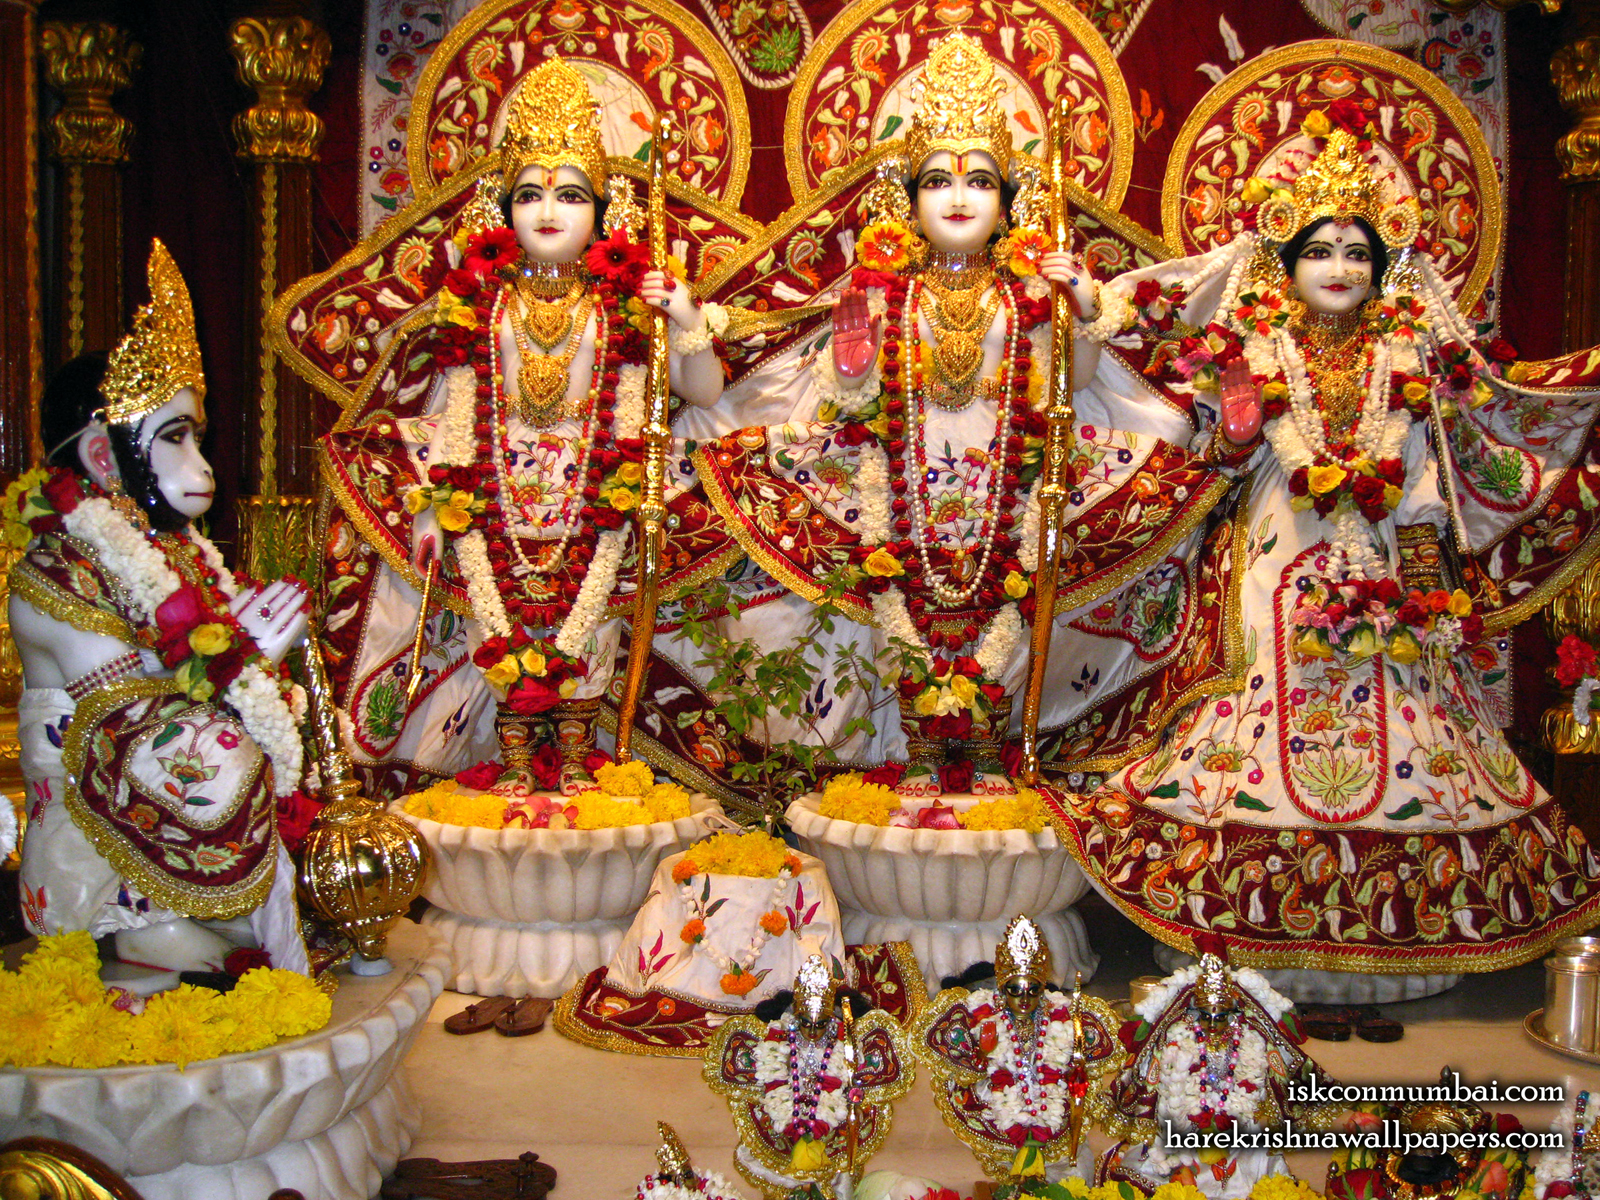 Sri Sri Sita Rama Laxman Hanuman Wallpaper (002) Size1600x1200 Download